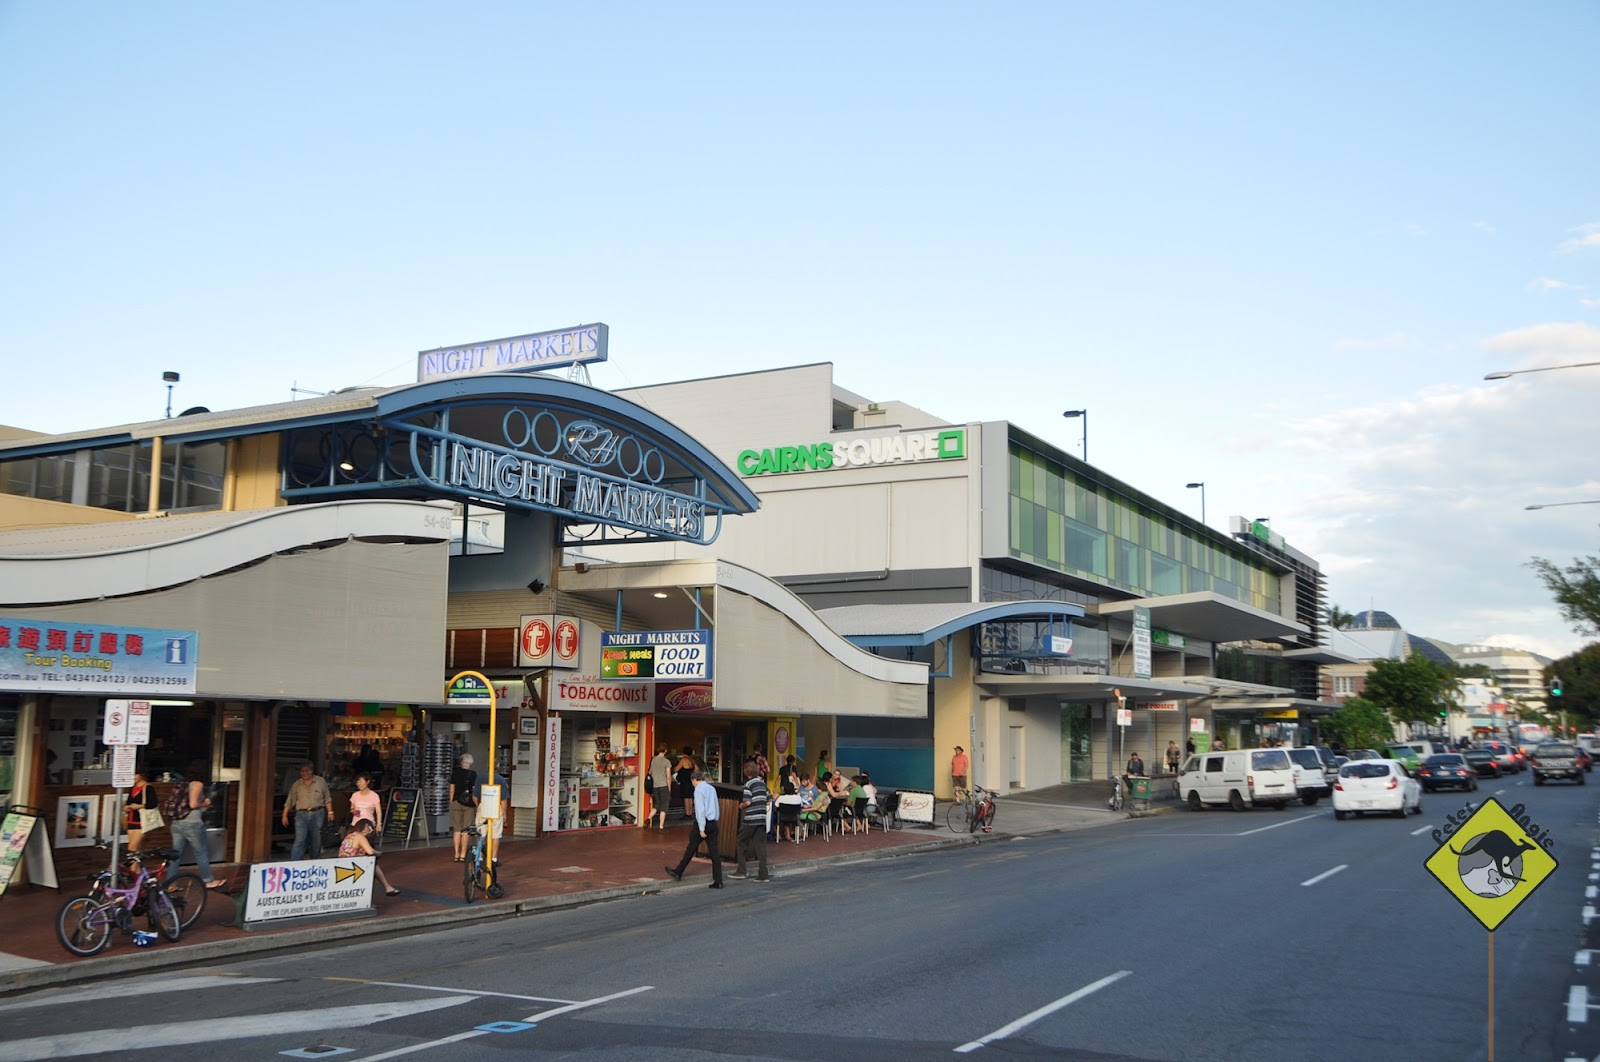 Cairns Food Market